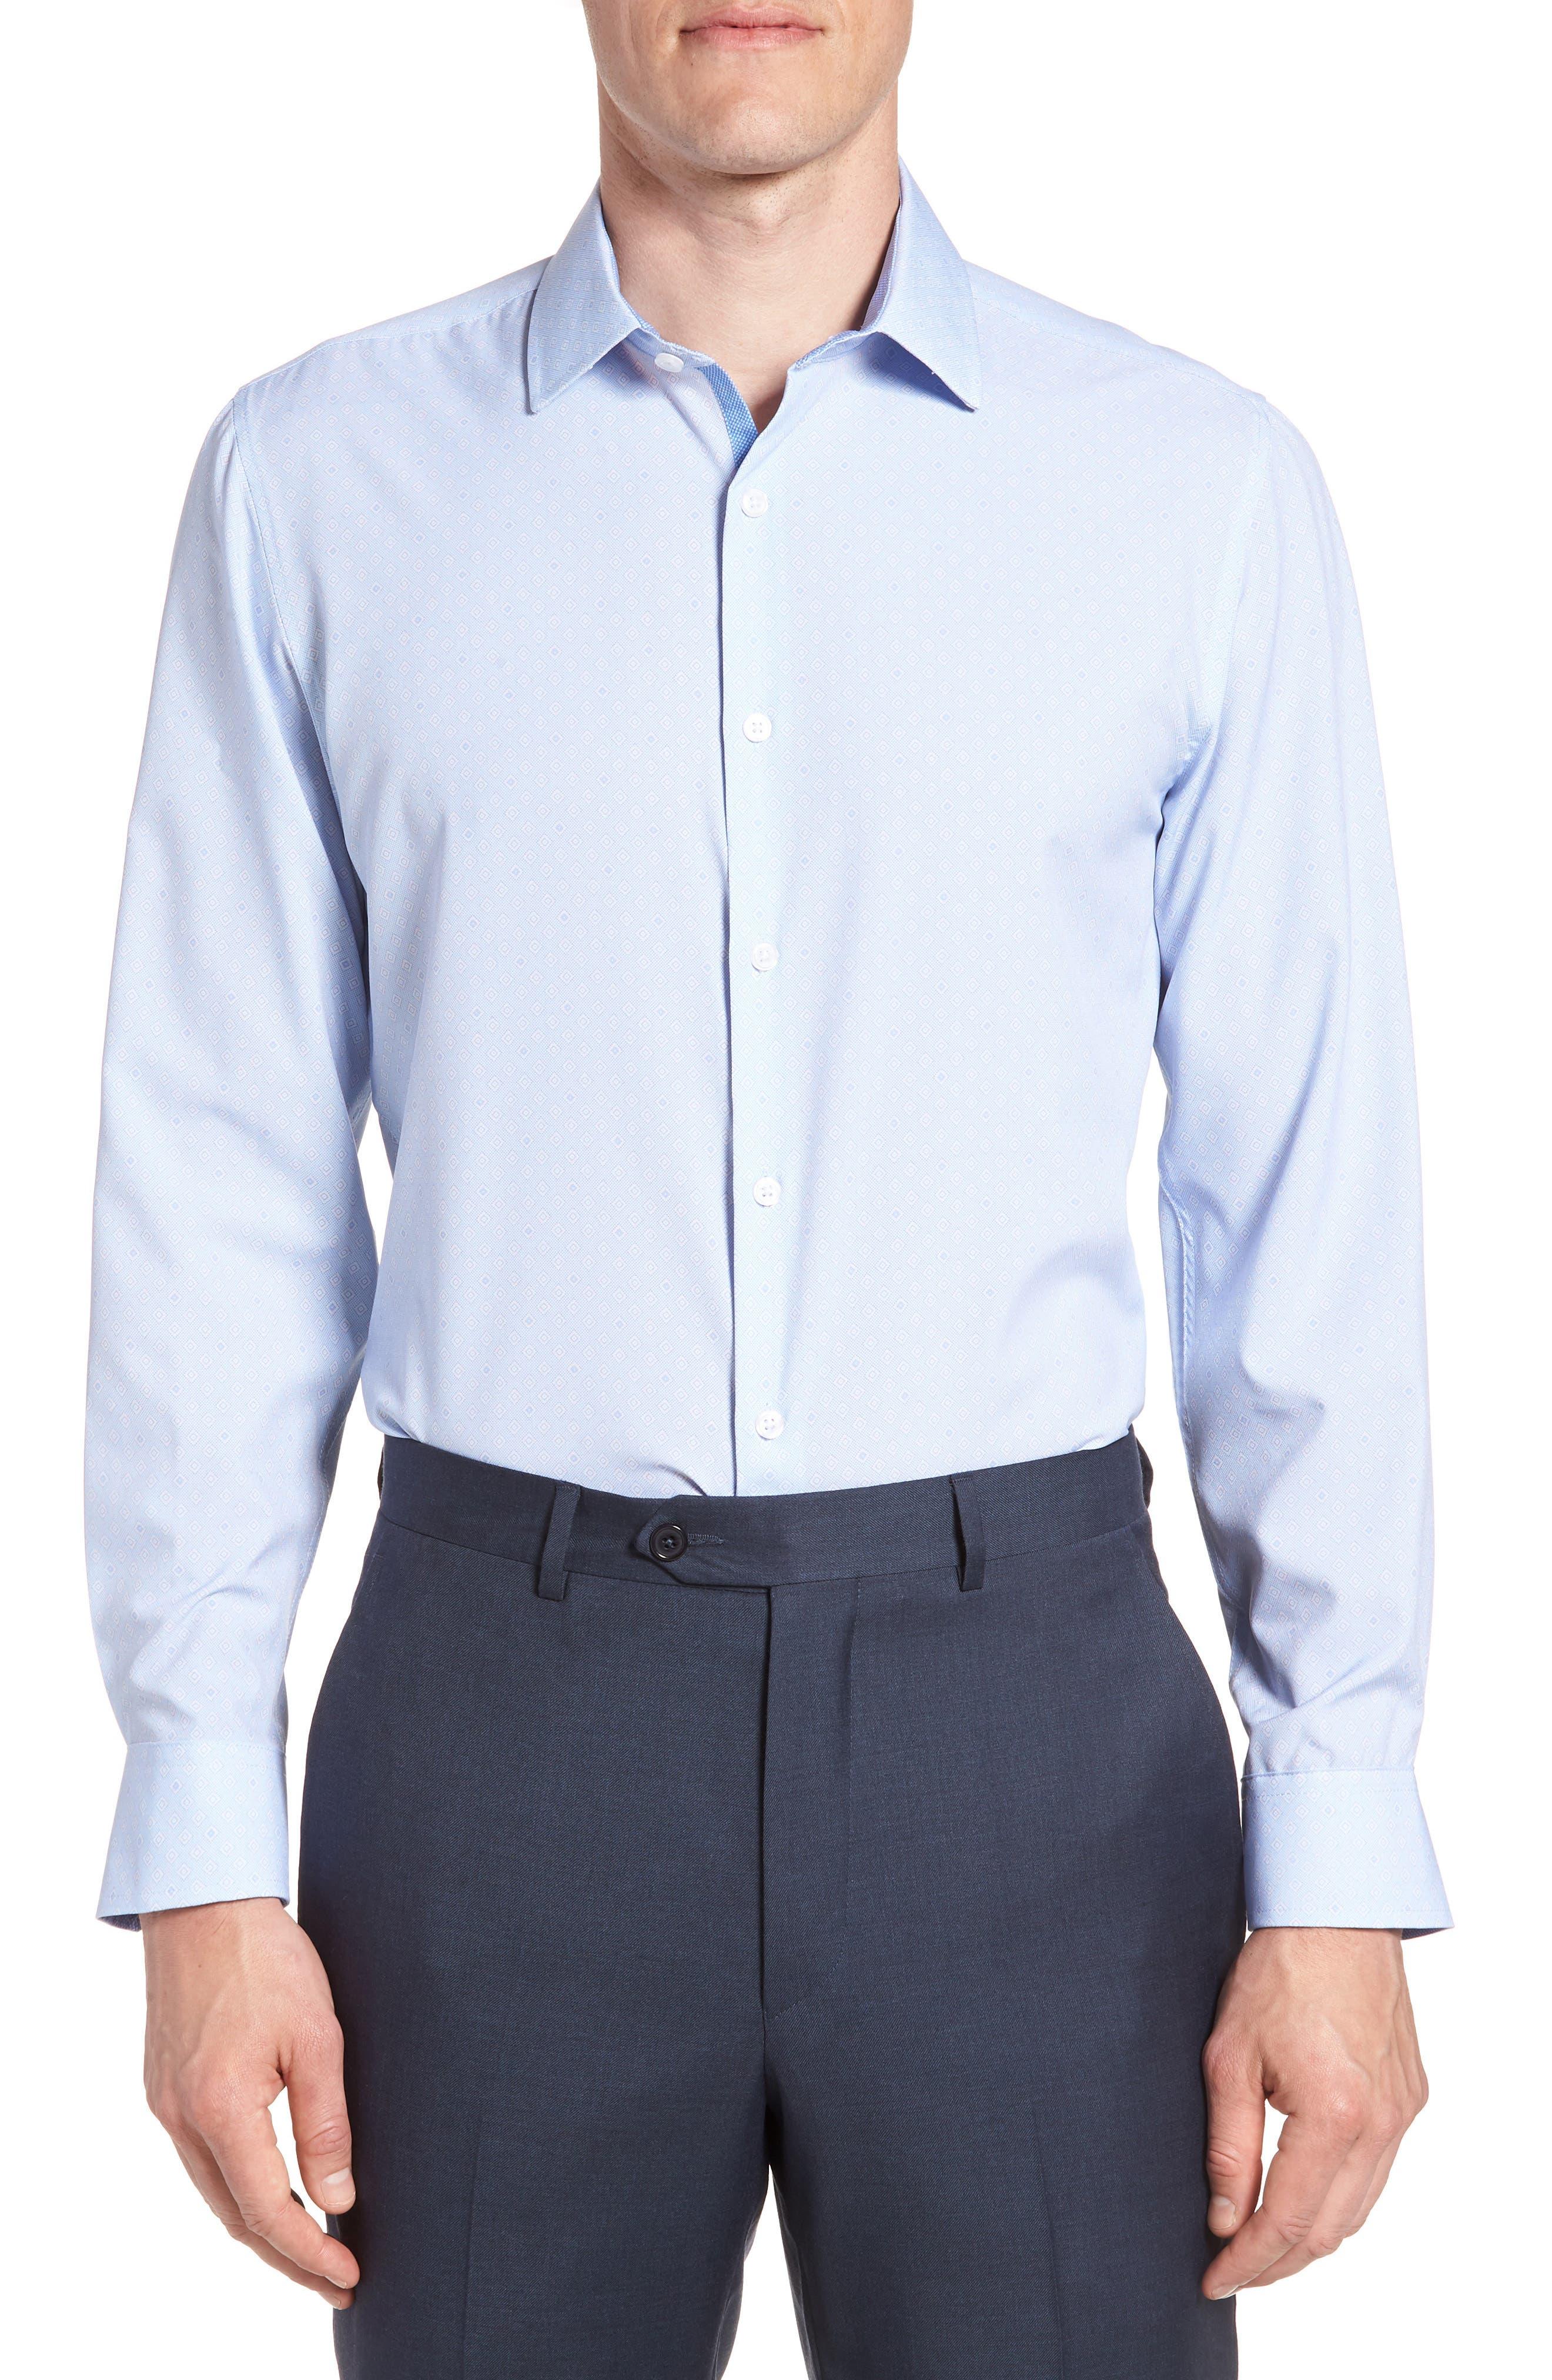 Trim Fit Geometric 4-Way Stretch Dress Shirt,                         Main,                         color, BLUE